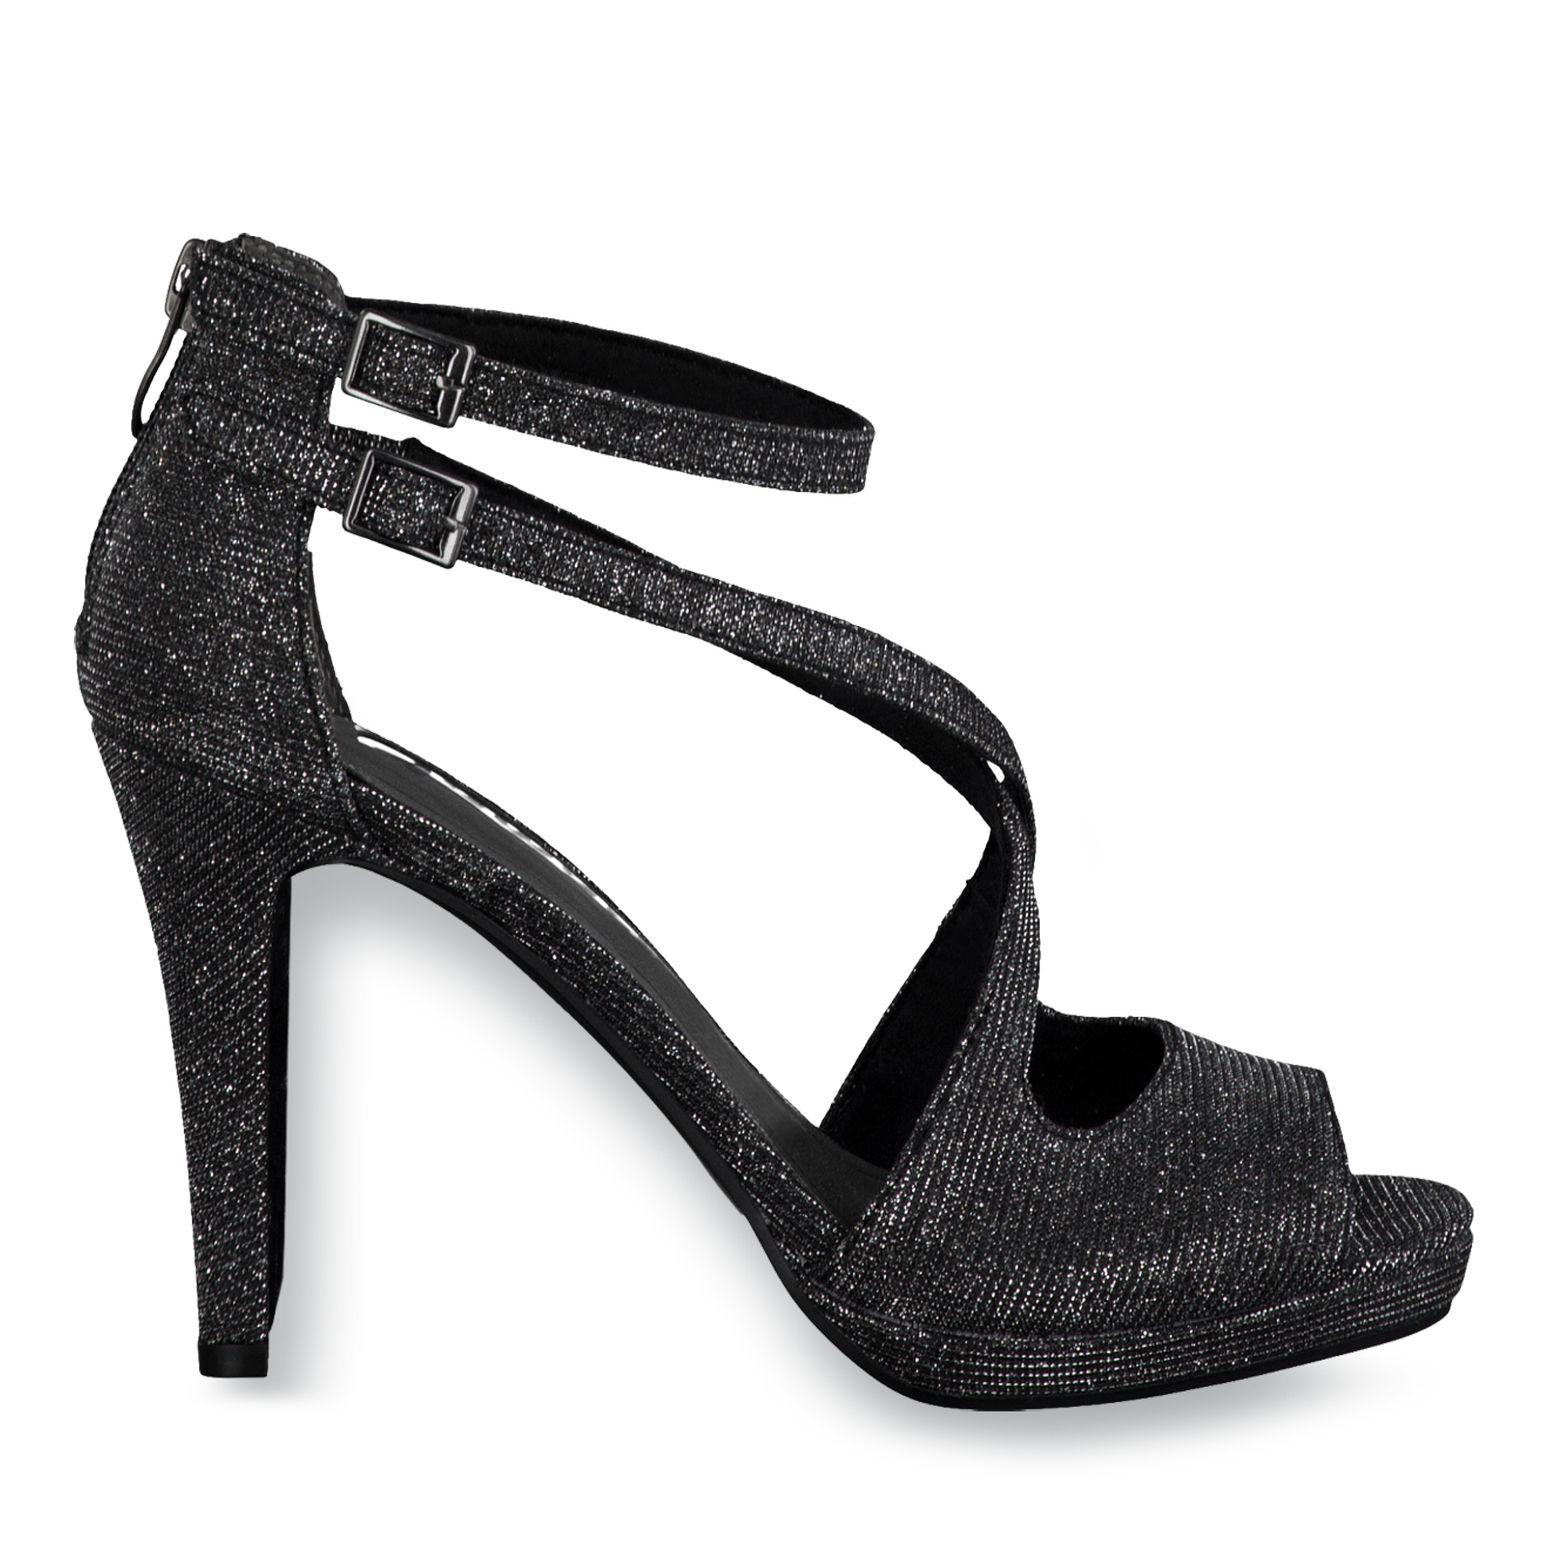 Tamaris High Heels Pumps Sandaletten Glitzer Gr. 37 schwarz